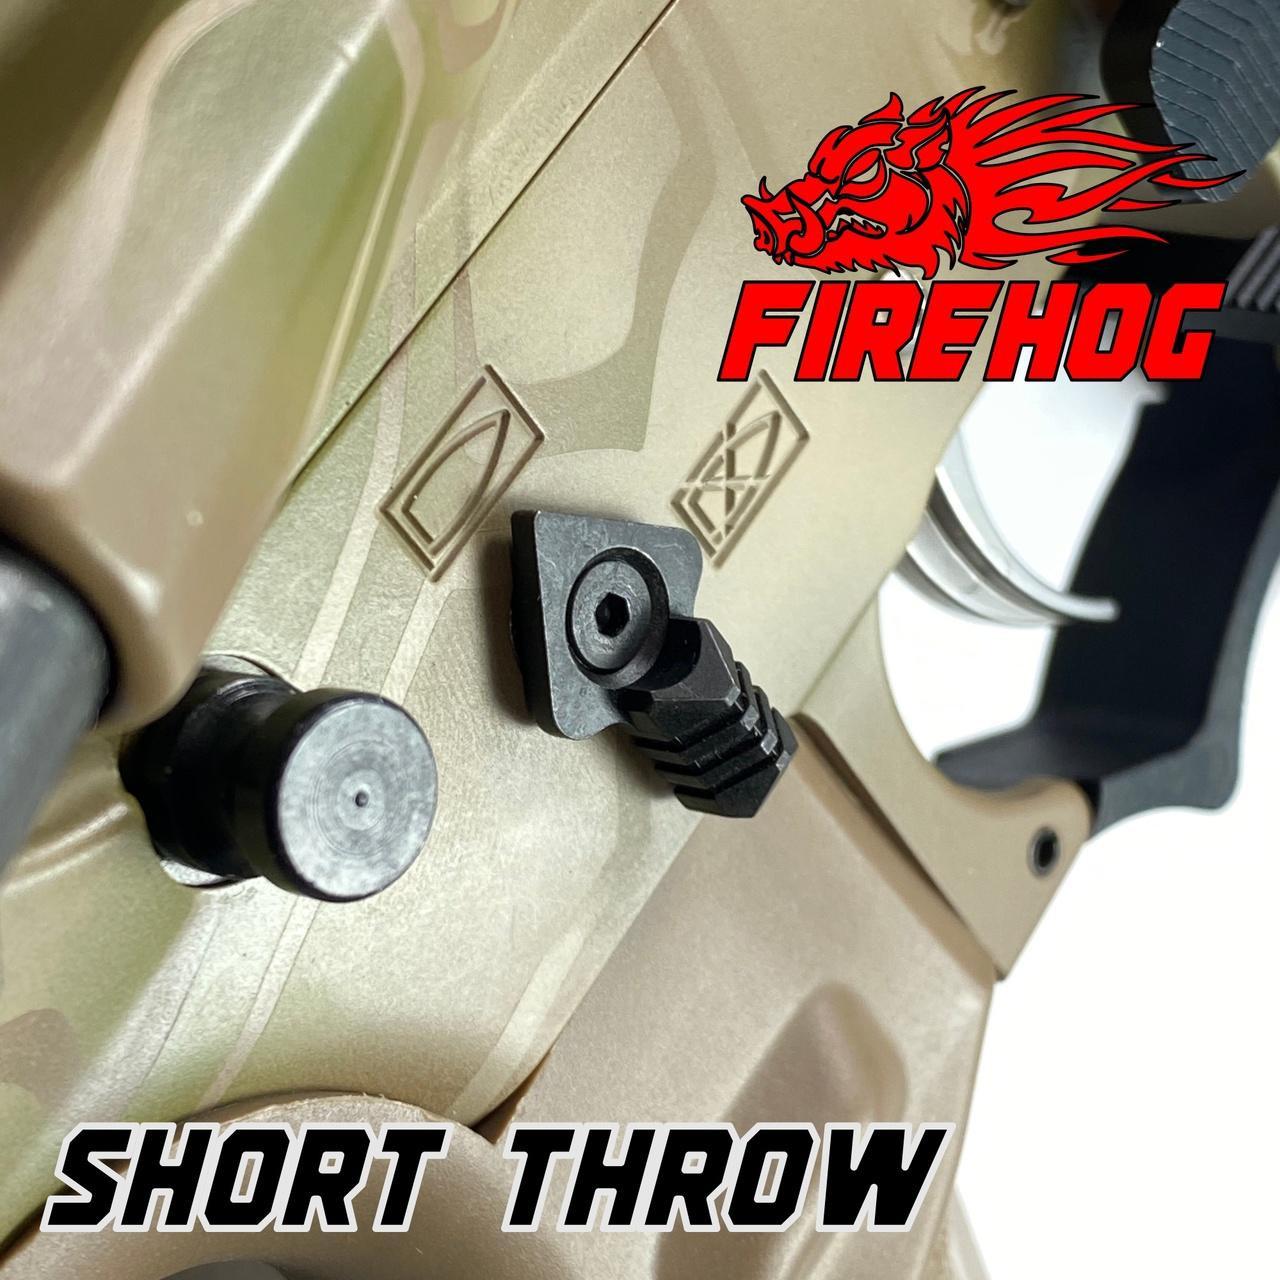 FIREHOG Fire Hog Mod-A90SS Ambidextrous 90 Safety Selector Ambi - RED